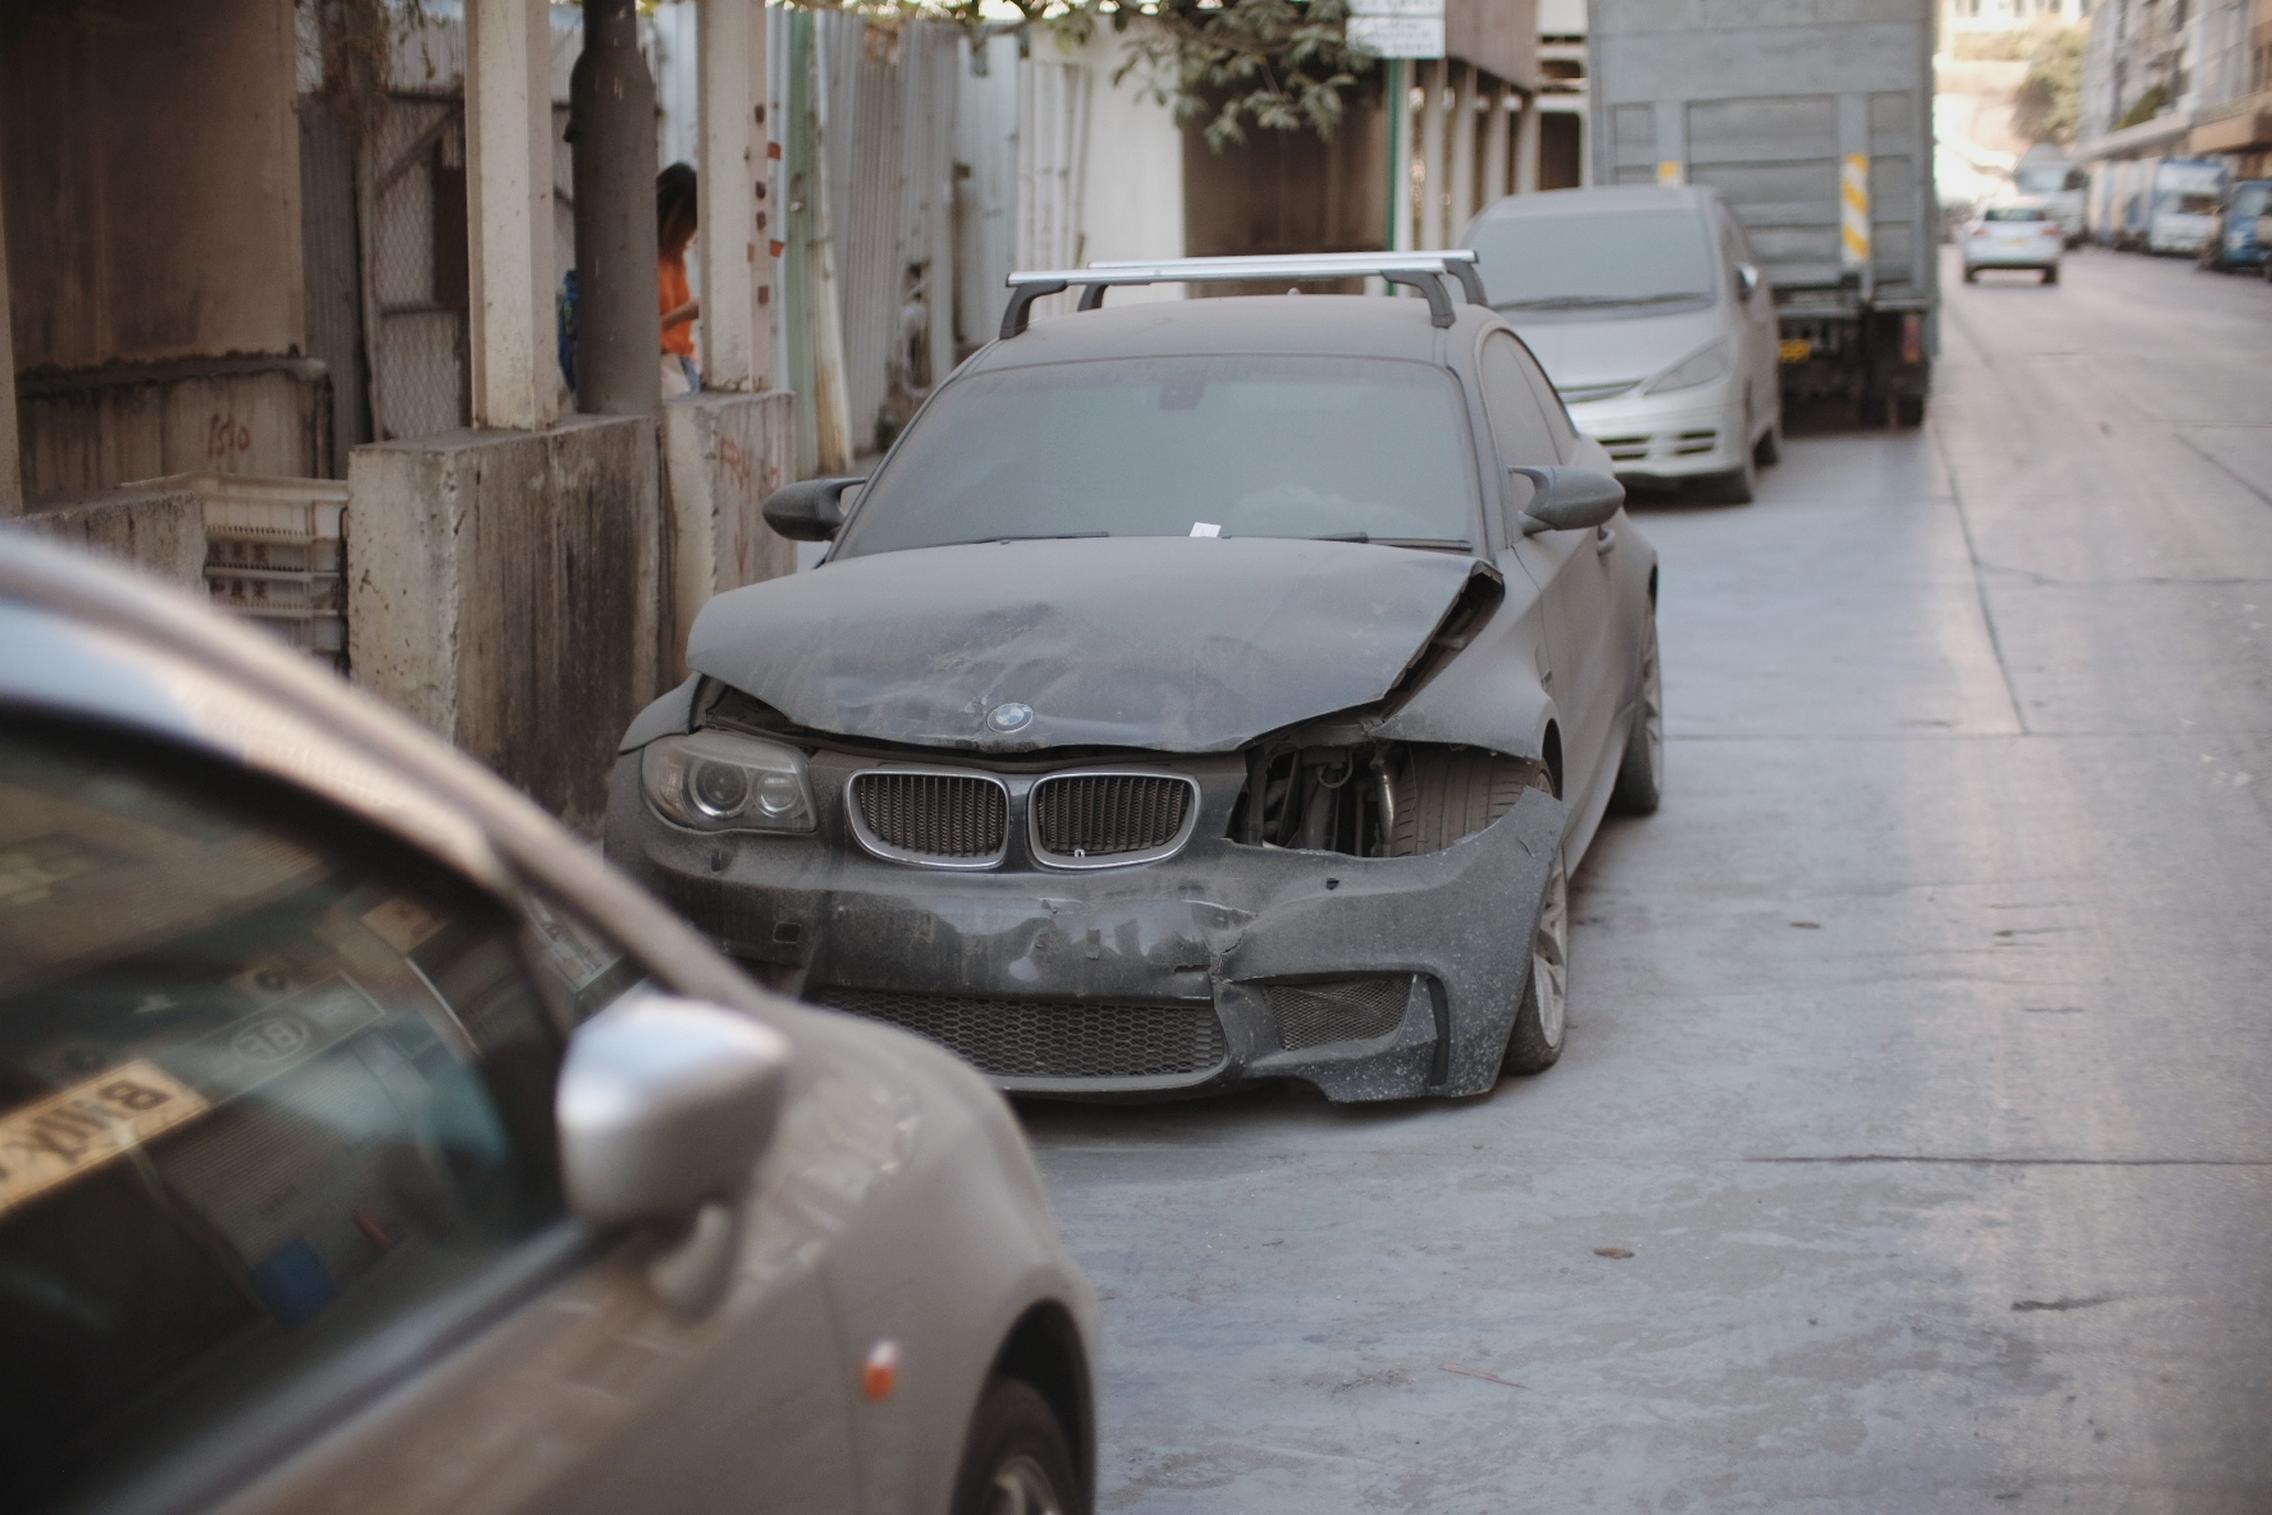 Crashed-BMW-1M-Coupe